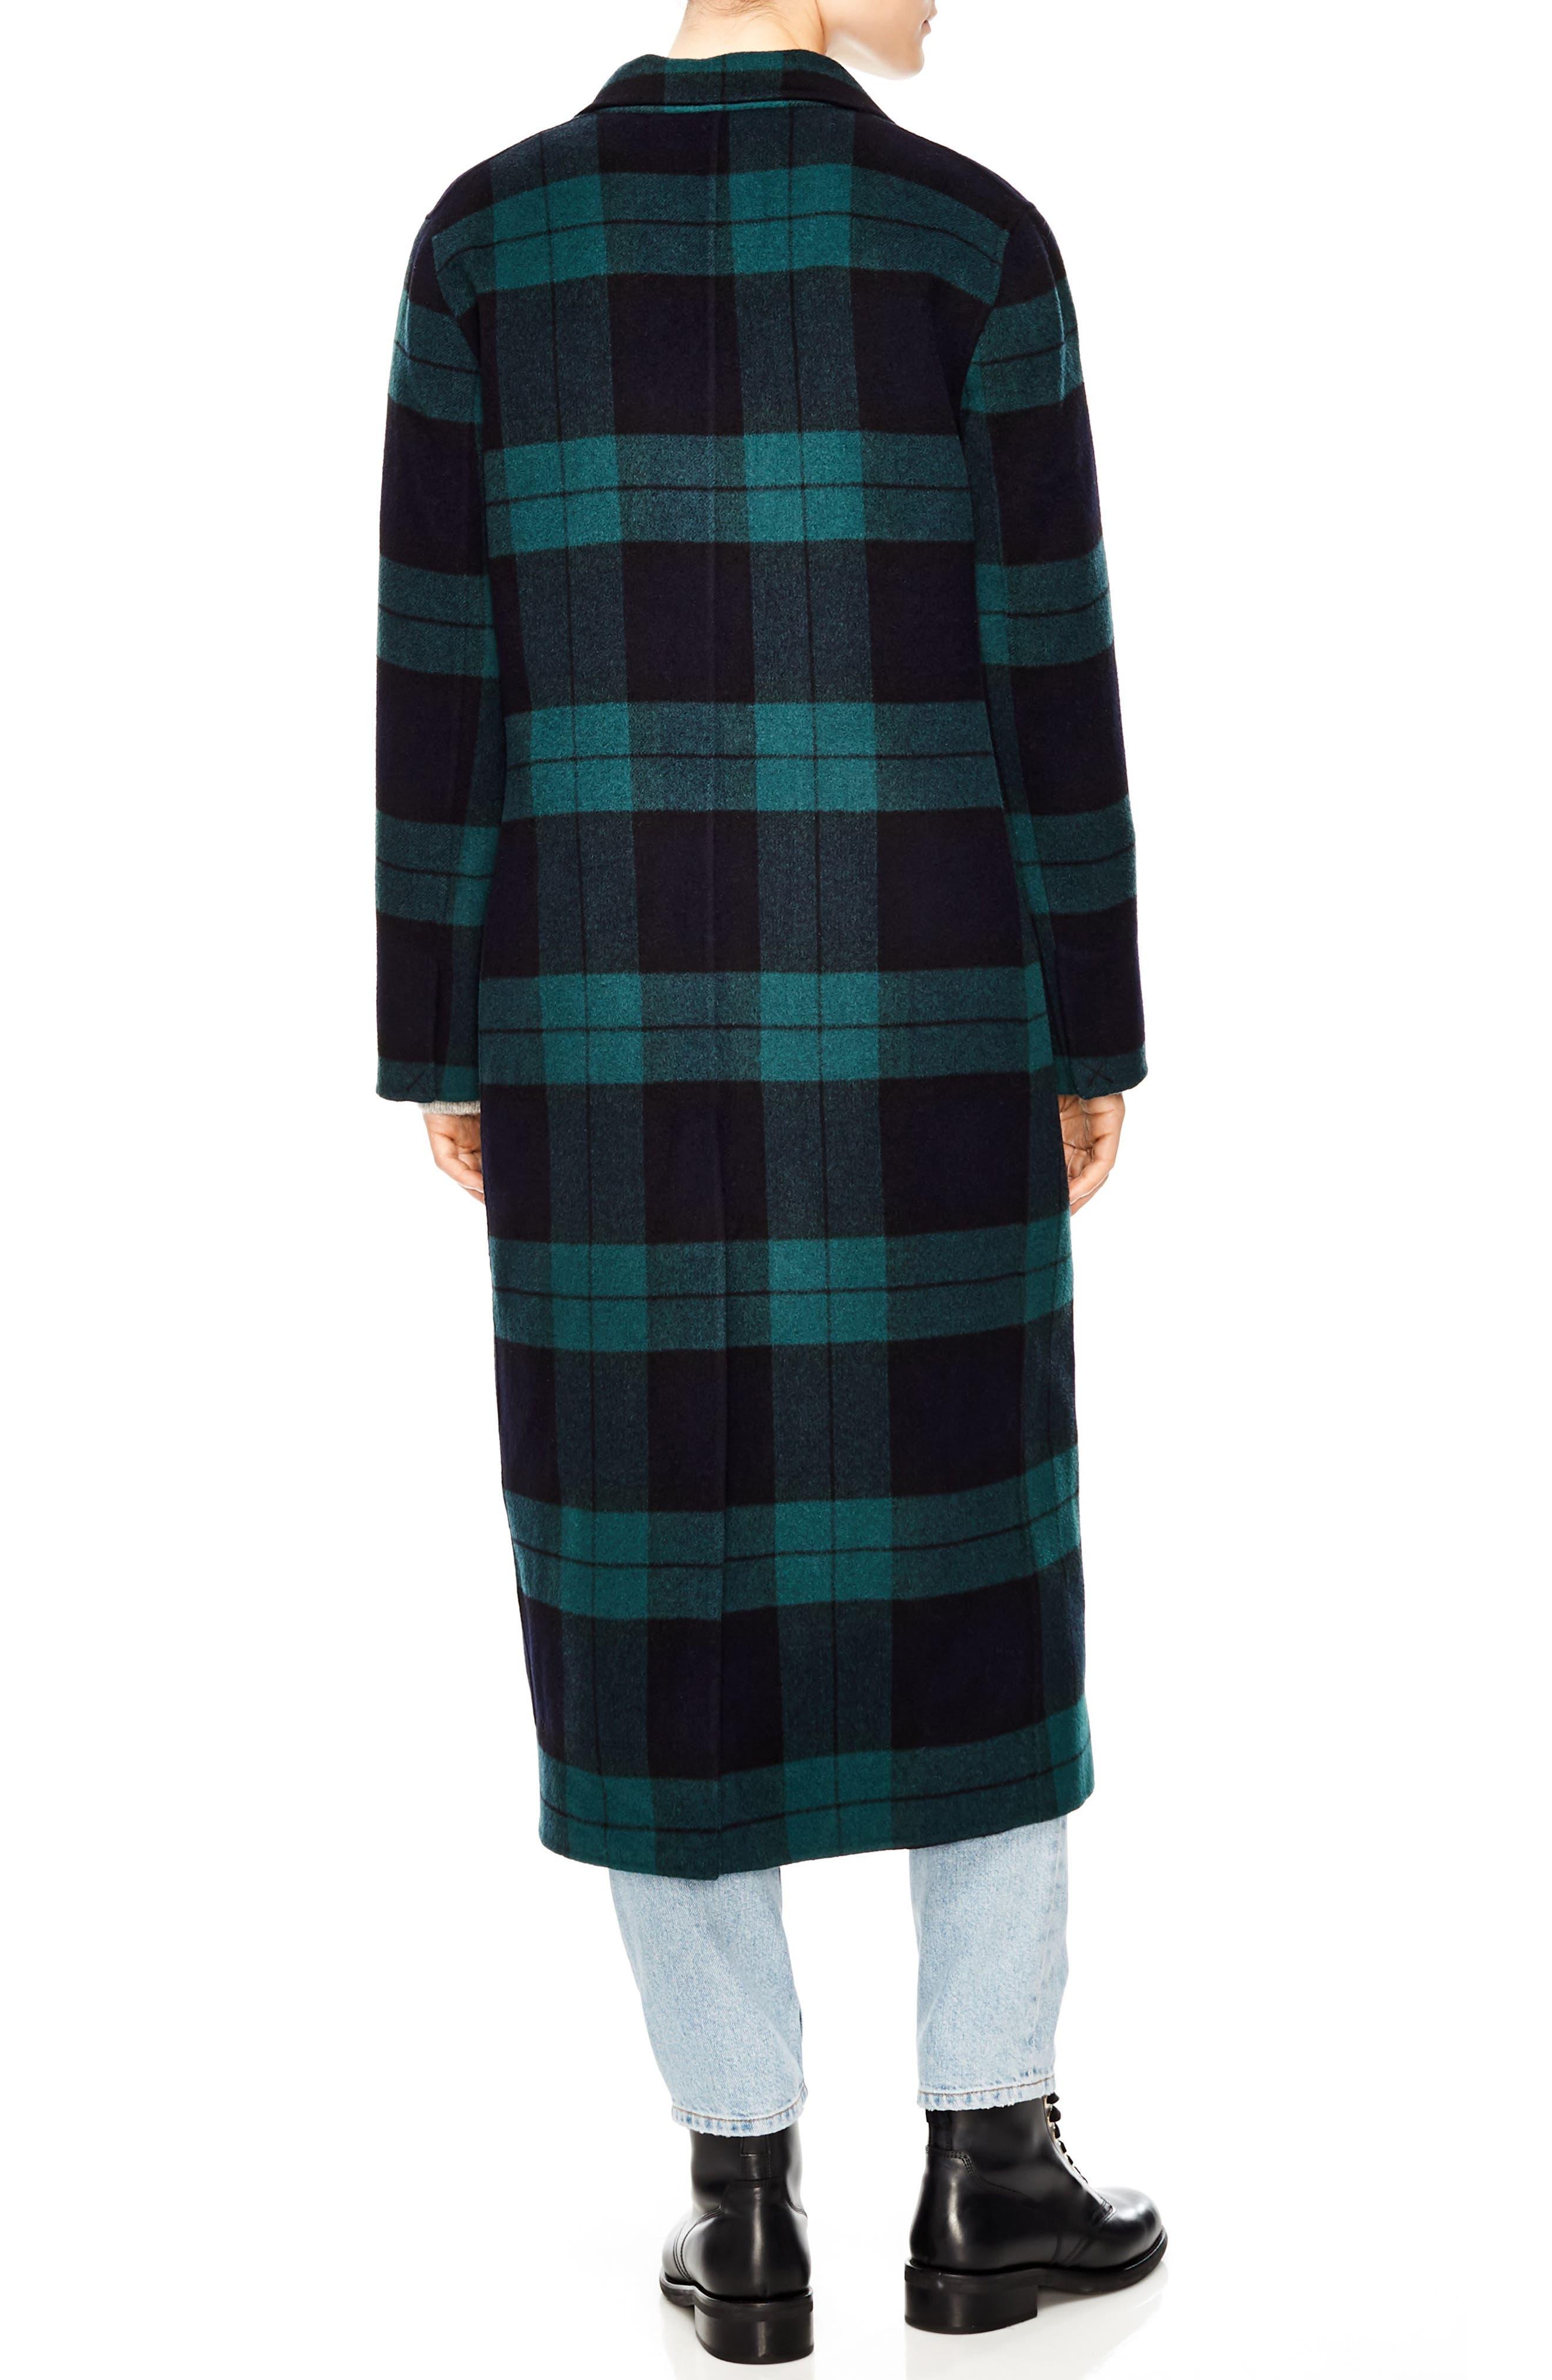 Pense Plaid Wool Blend Coat,                             Alternate thumbnail 2, color,                             GREEN